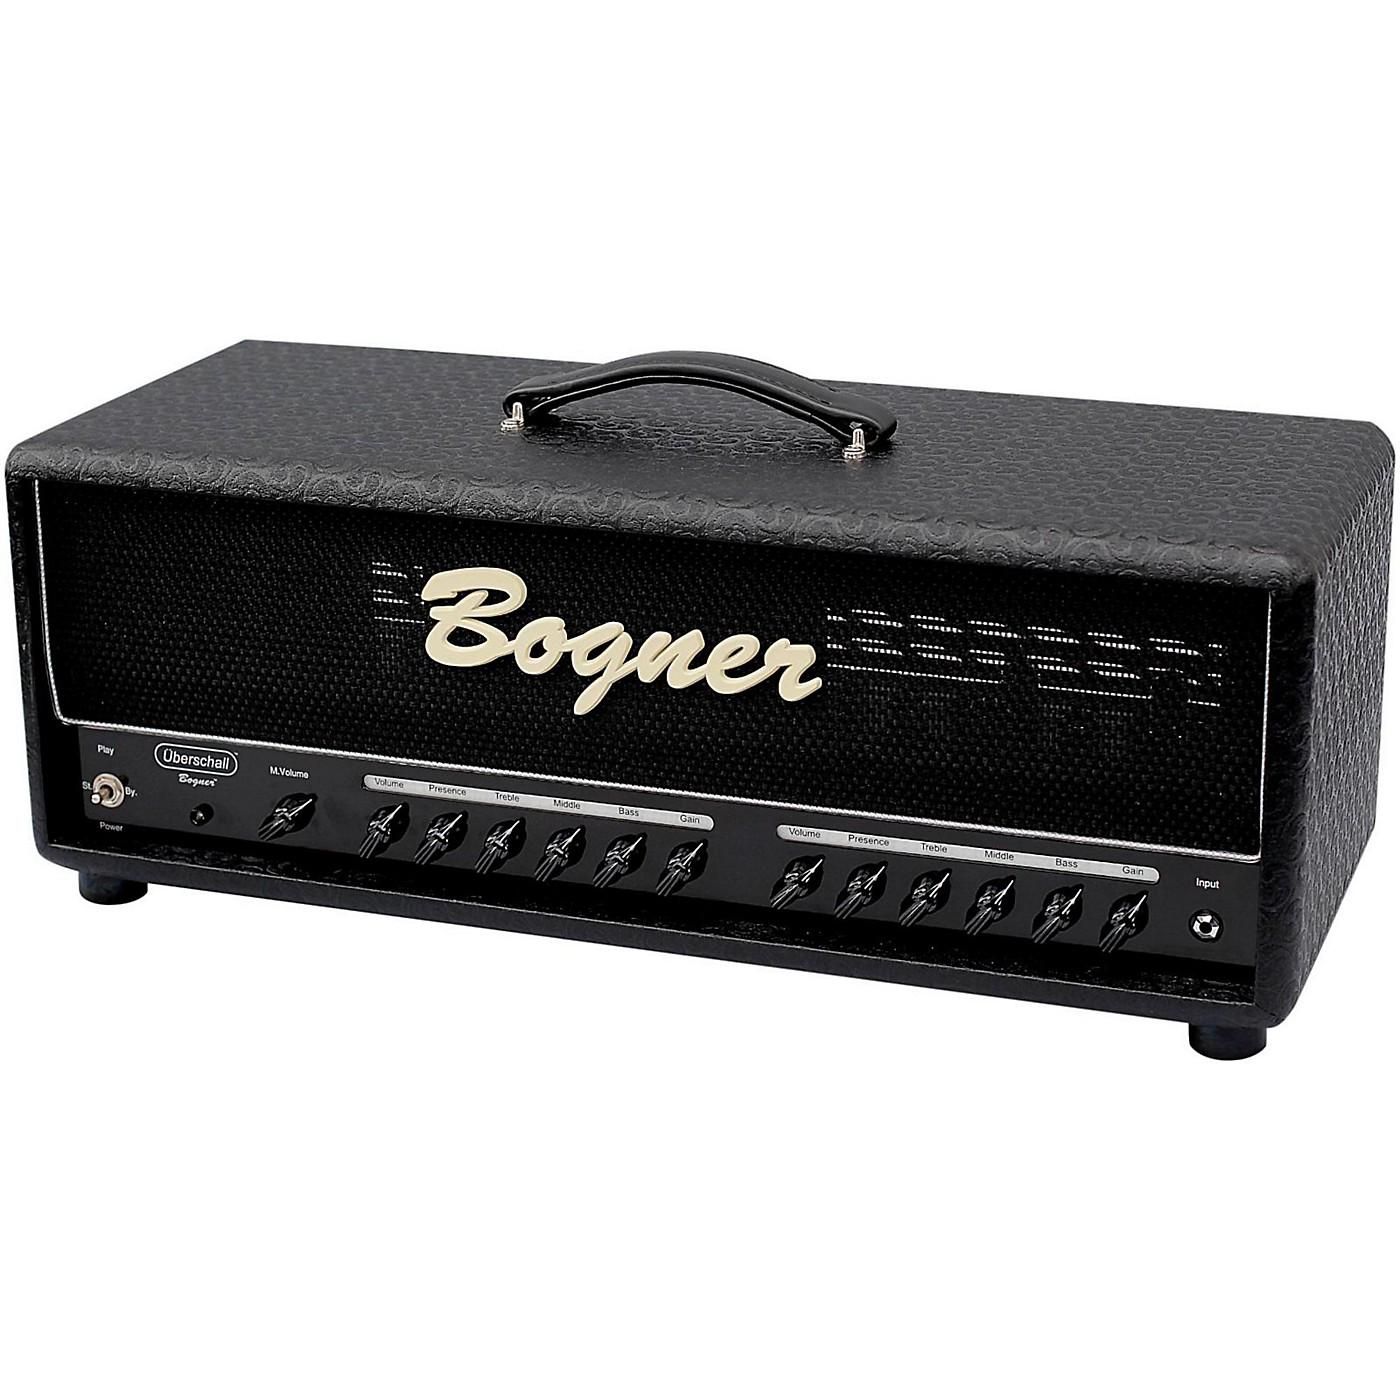 Bogner Uberschall 120W EL34 Tube Guitar Amp Head Comet Black thumbnail